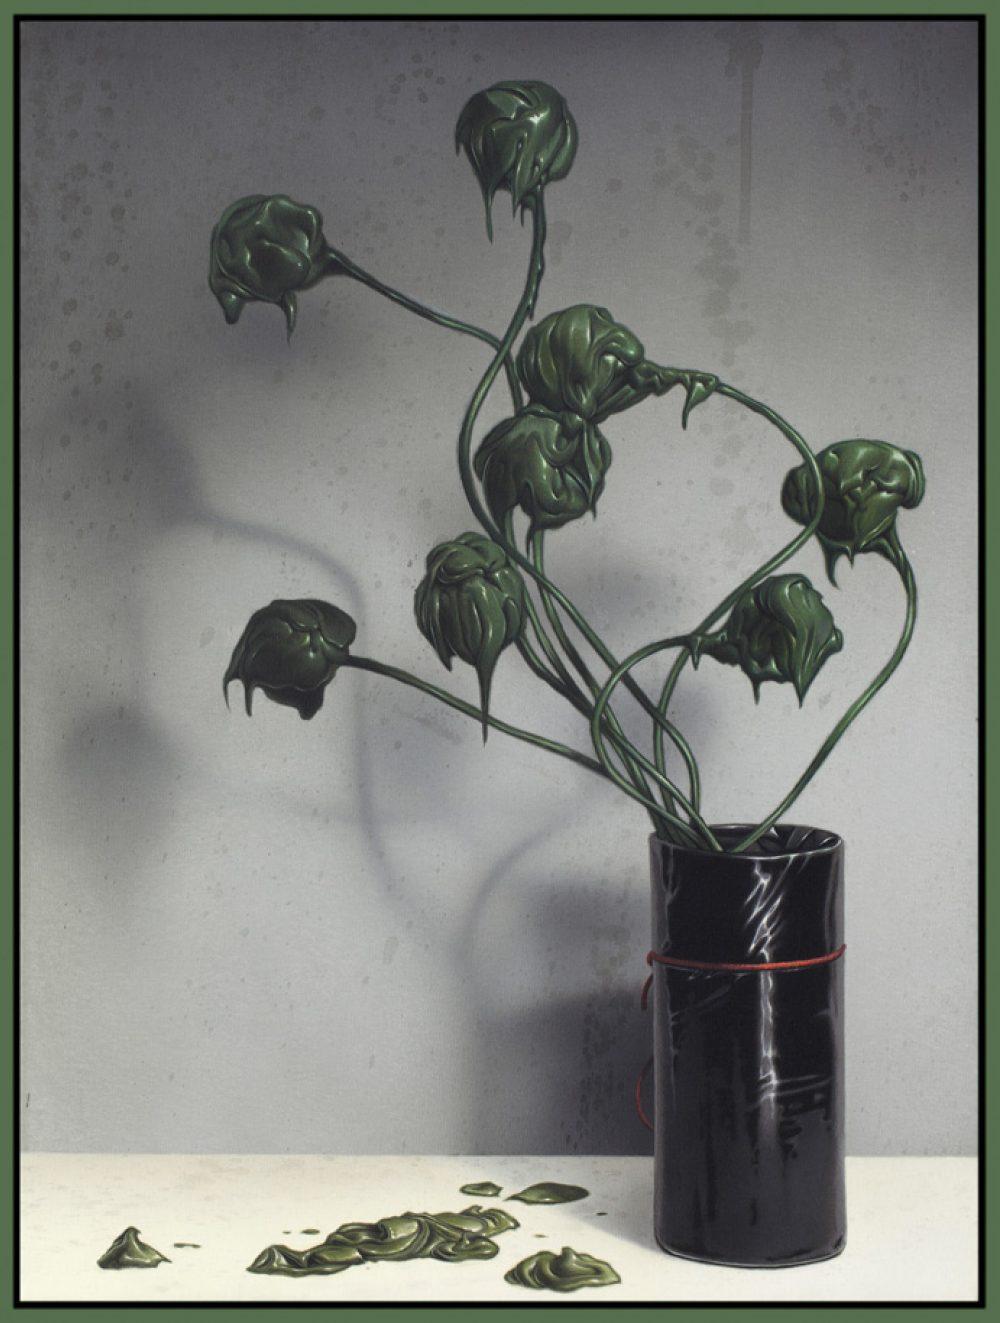 Dutch Flowers (2015), Acryl auf Leinwand, 55 x 40 cm